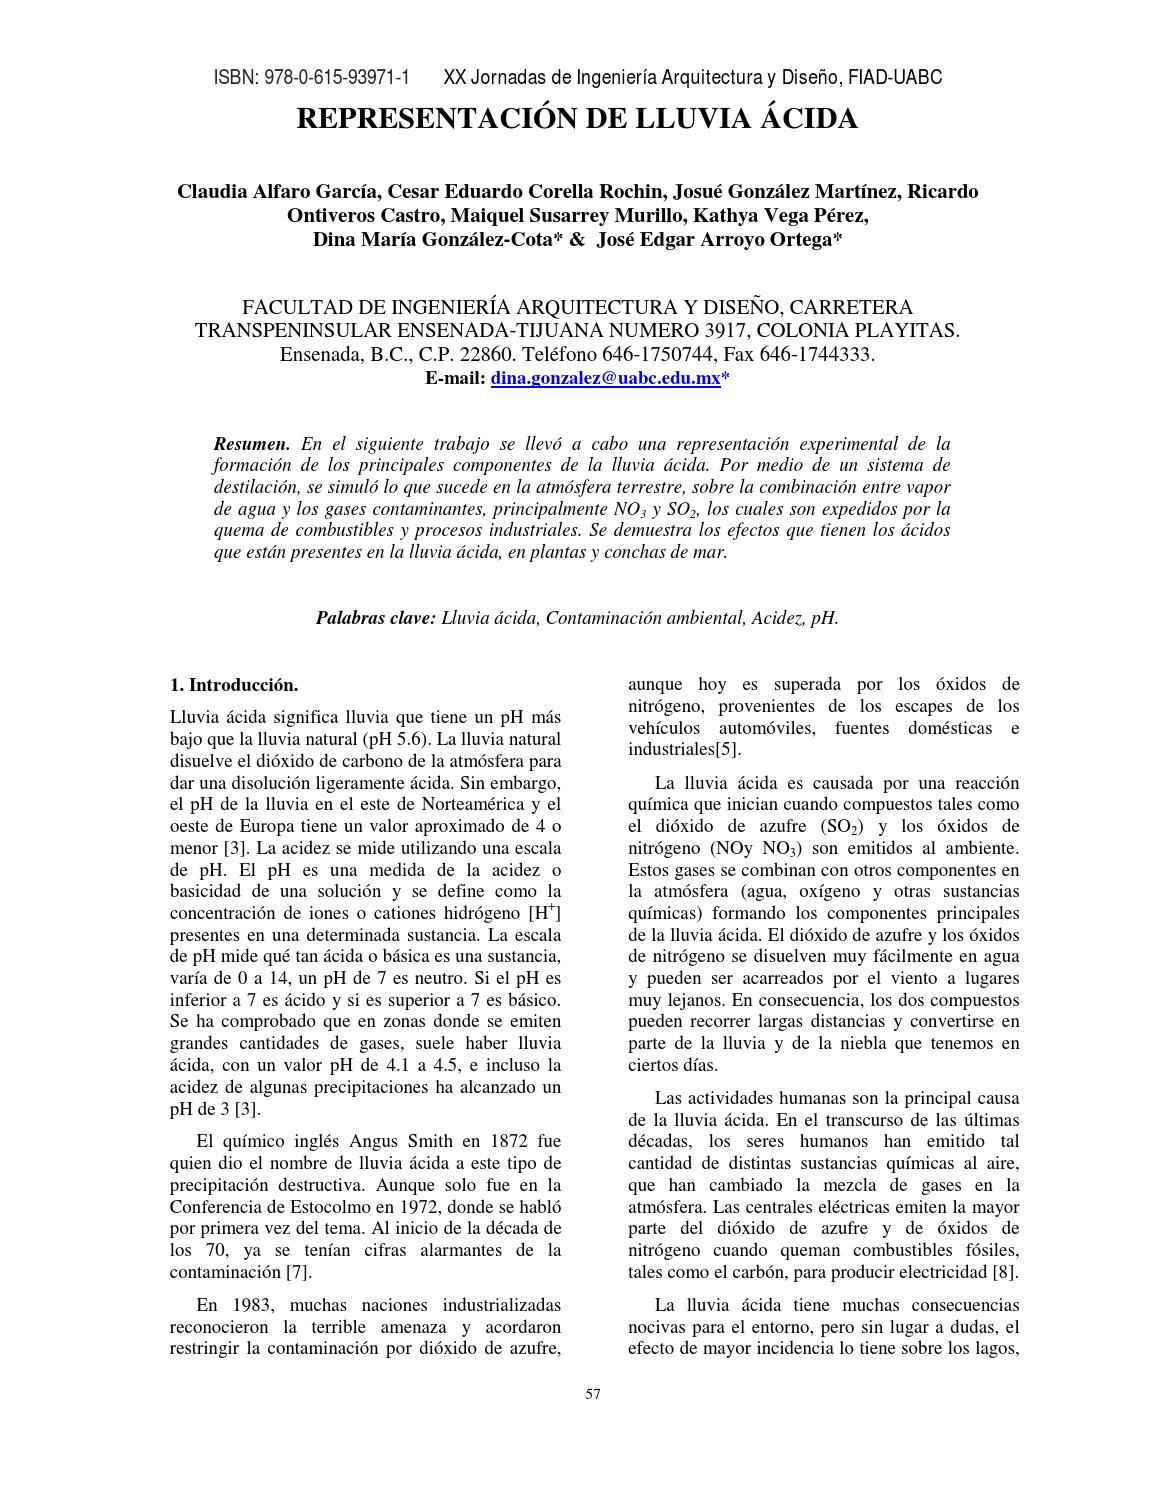 15 representaci n de lluvia cida by manuel jimenez issuu Arquitectura y diseno uabc